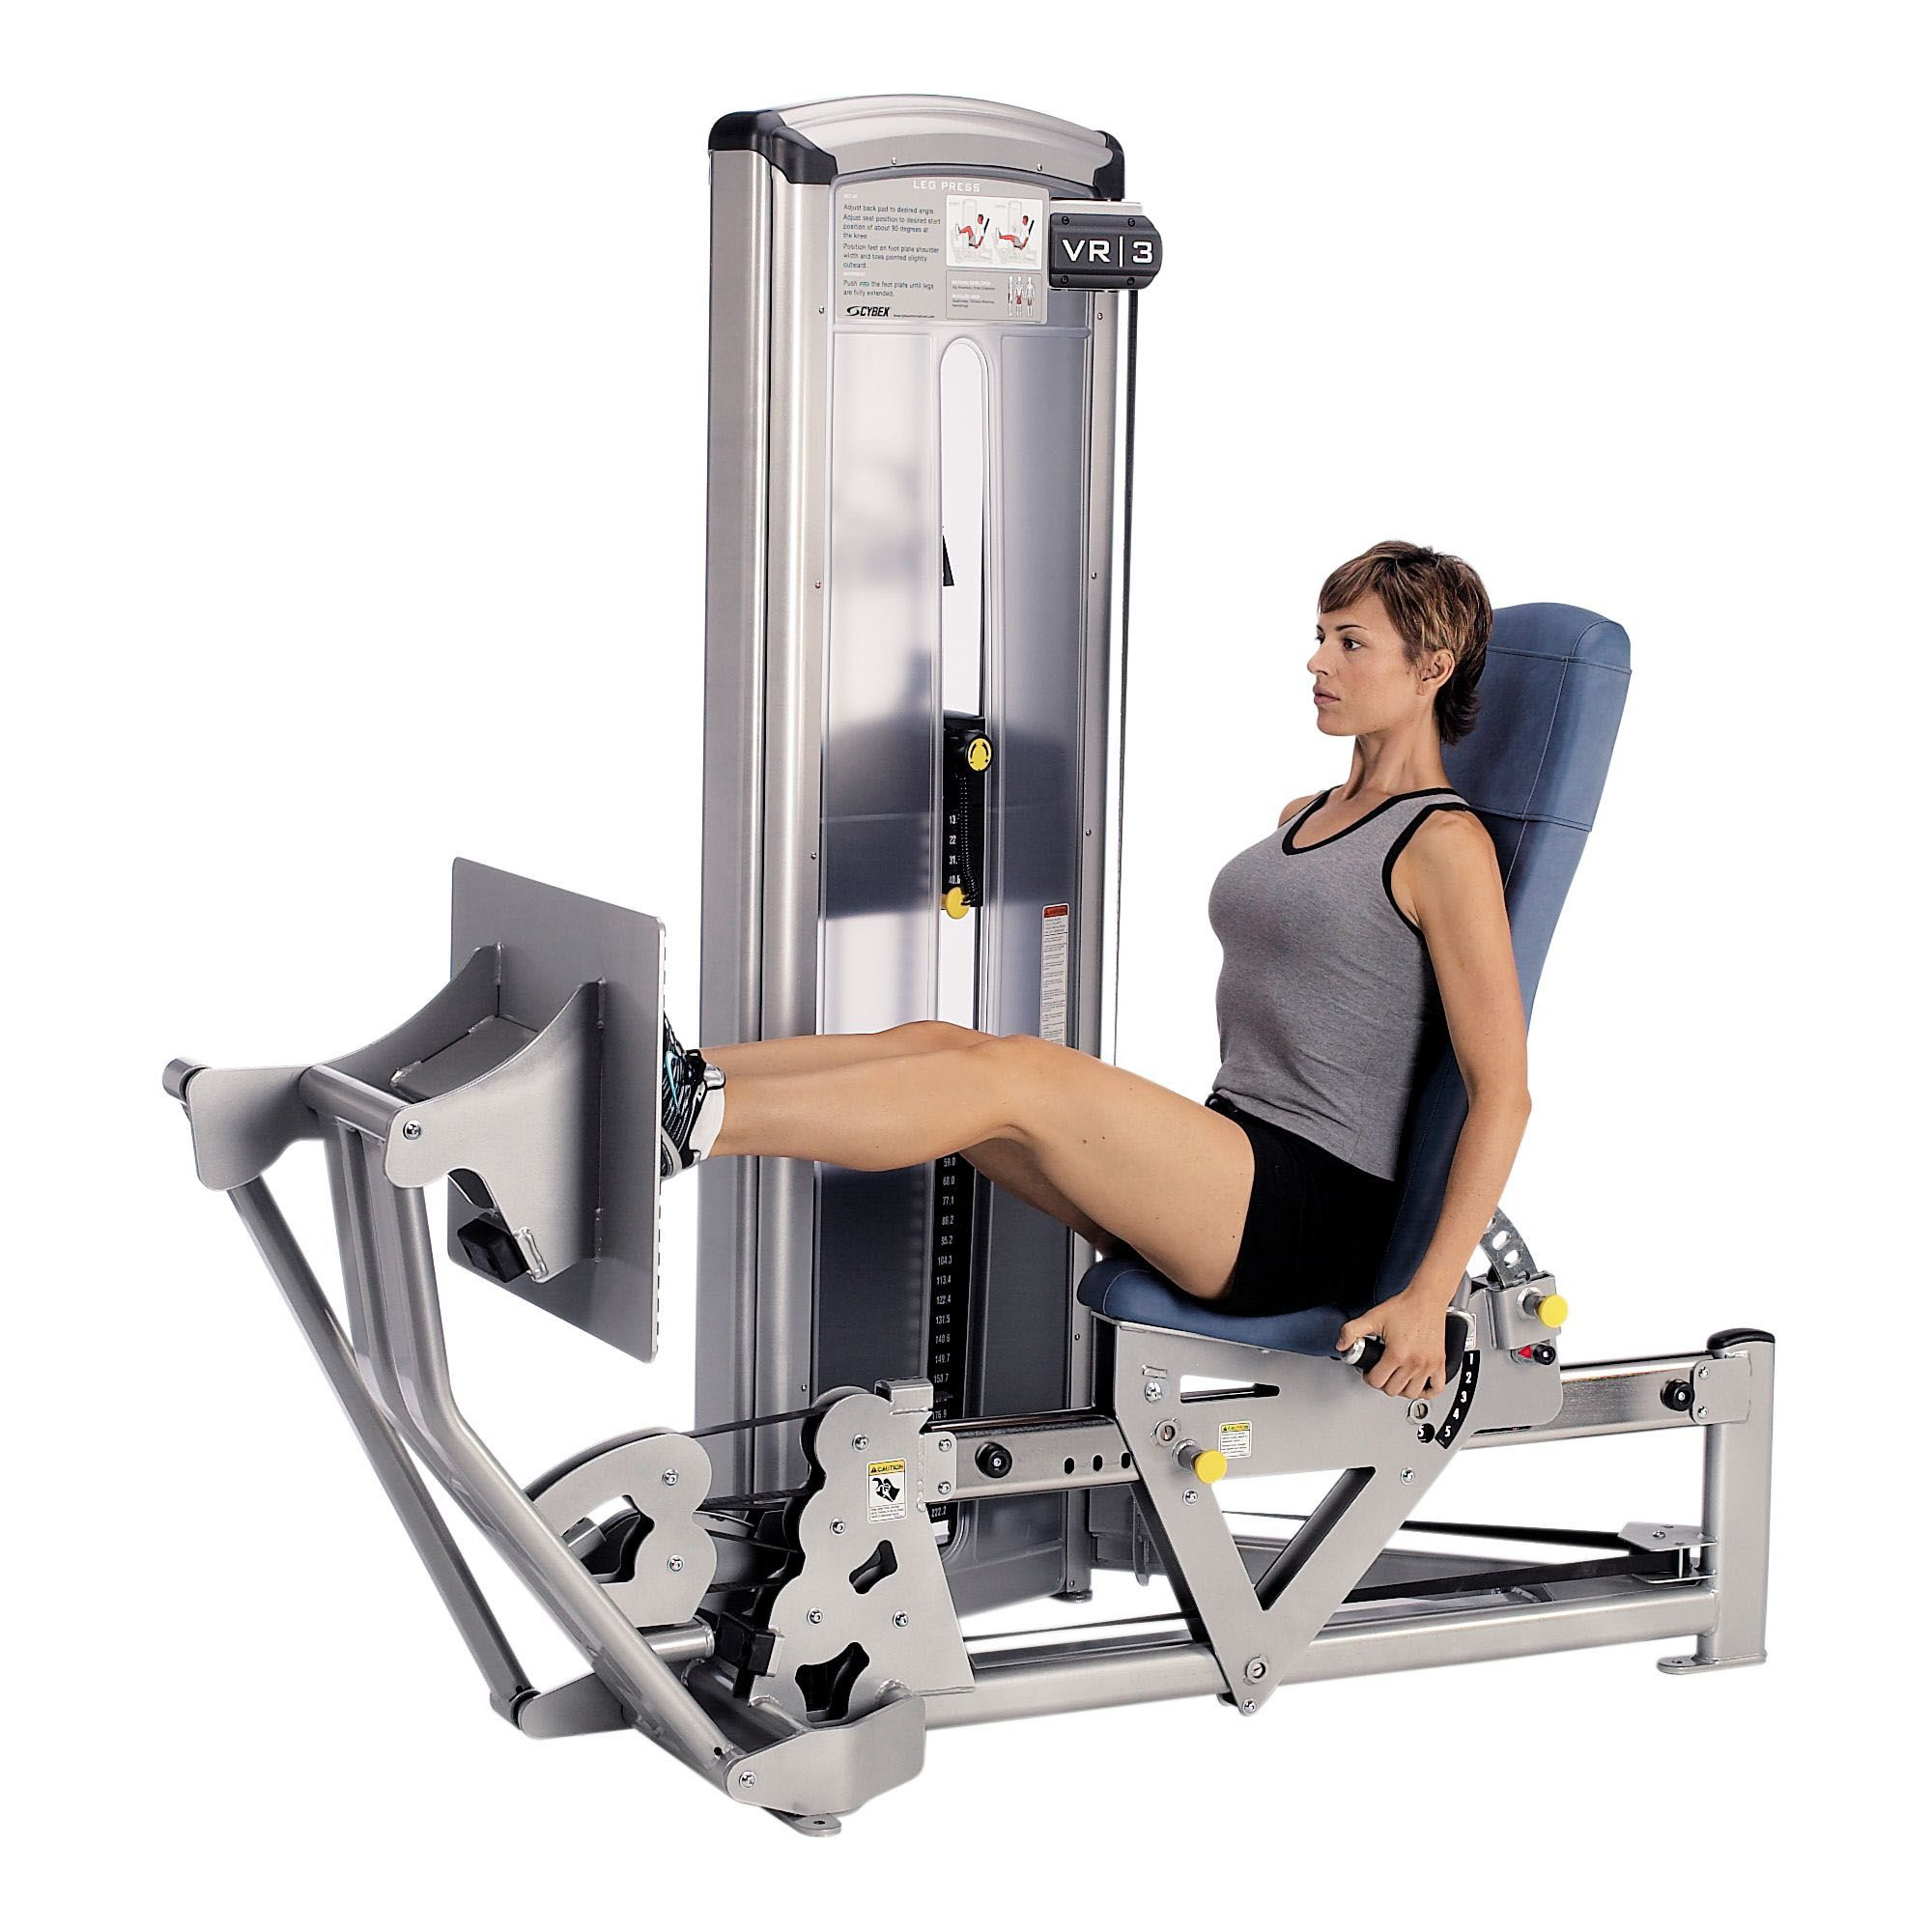 Gym Equipment Legs: Cybex VR3 Seated Leg Press